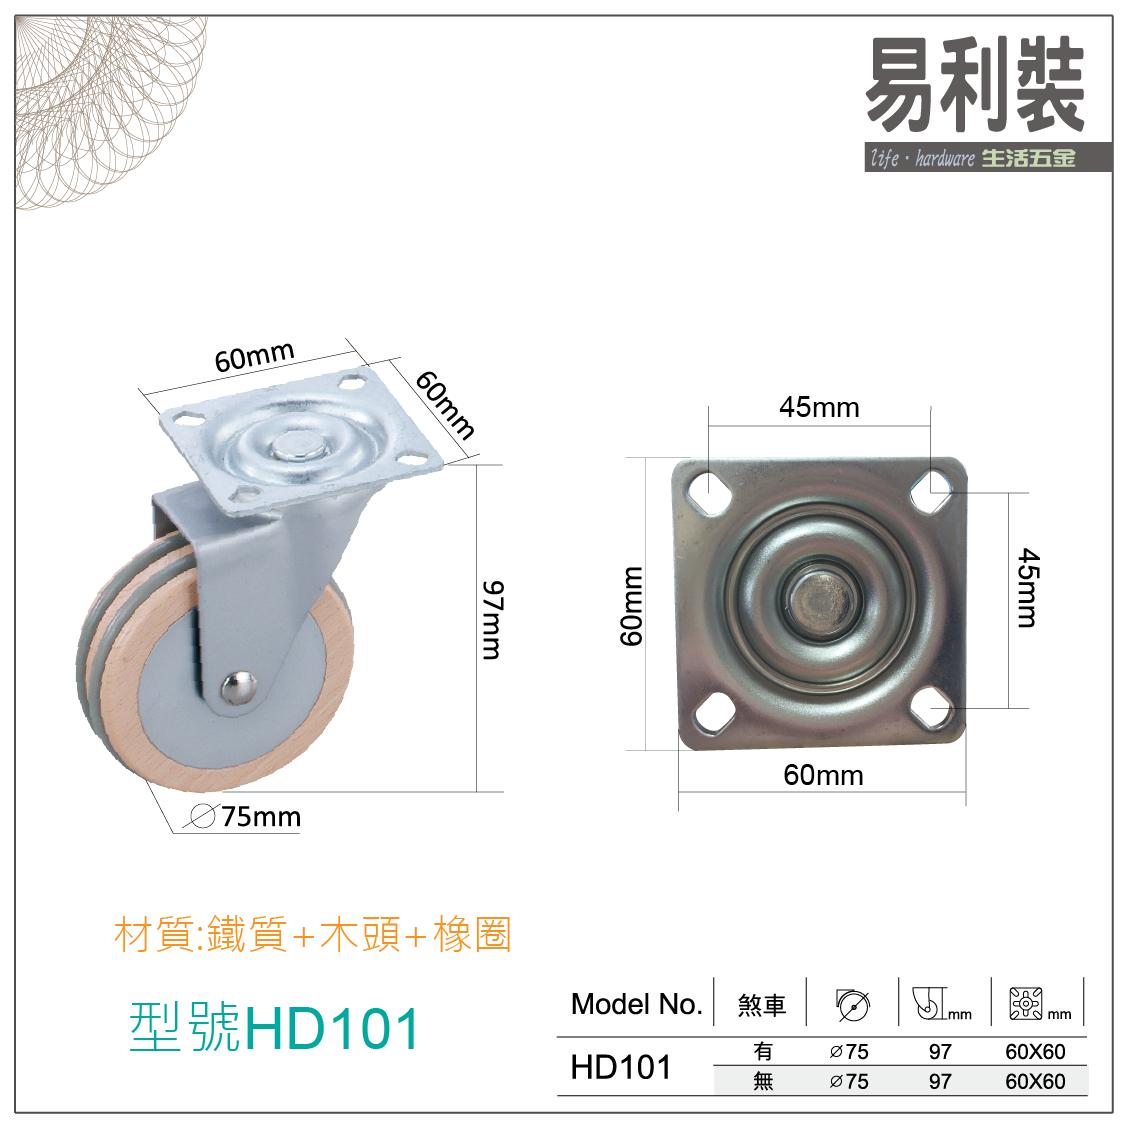 【 EASYCAN  】HD101 活動輪 易利裝生活五金 桌輪 櫃輪 房間 臥房 衣櫃 小資族 辦公家具 系統家具 1